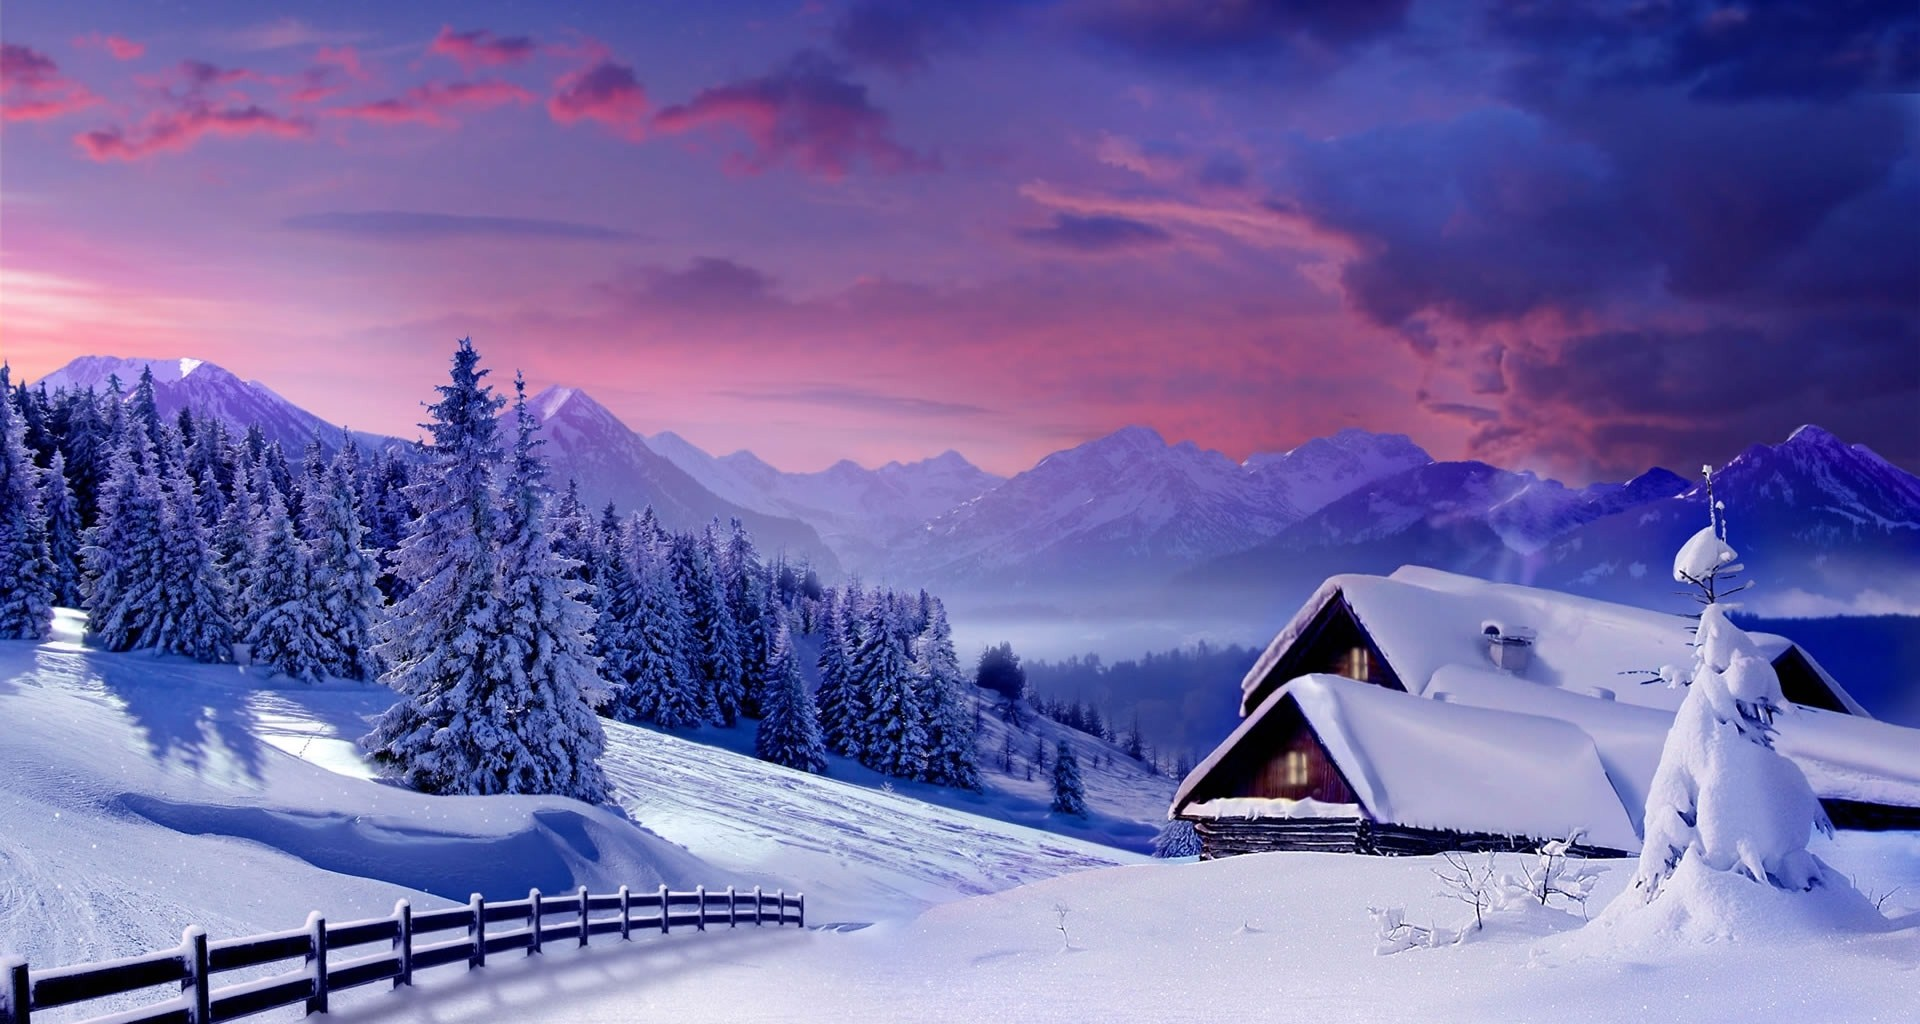 Free Winter Scenes Desktop Backgrounds Page 1